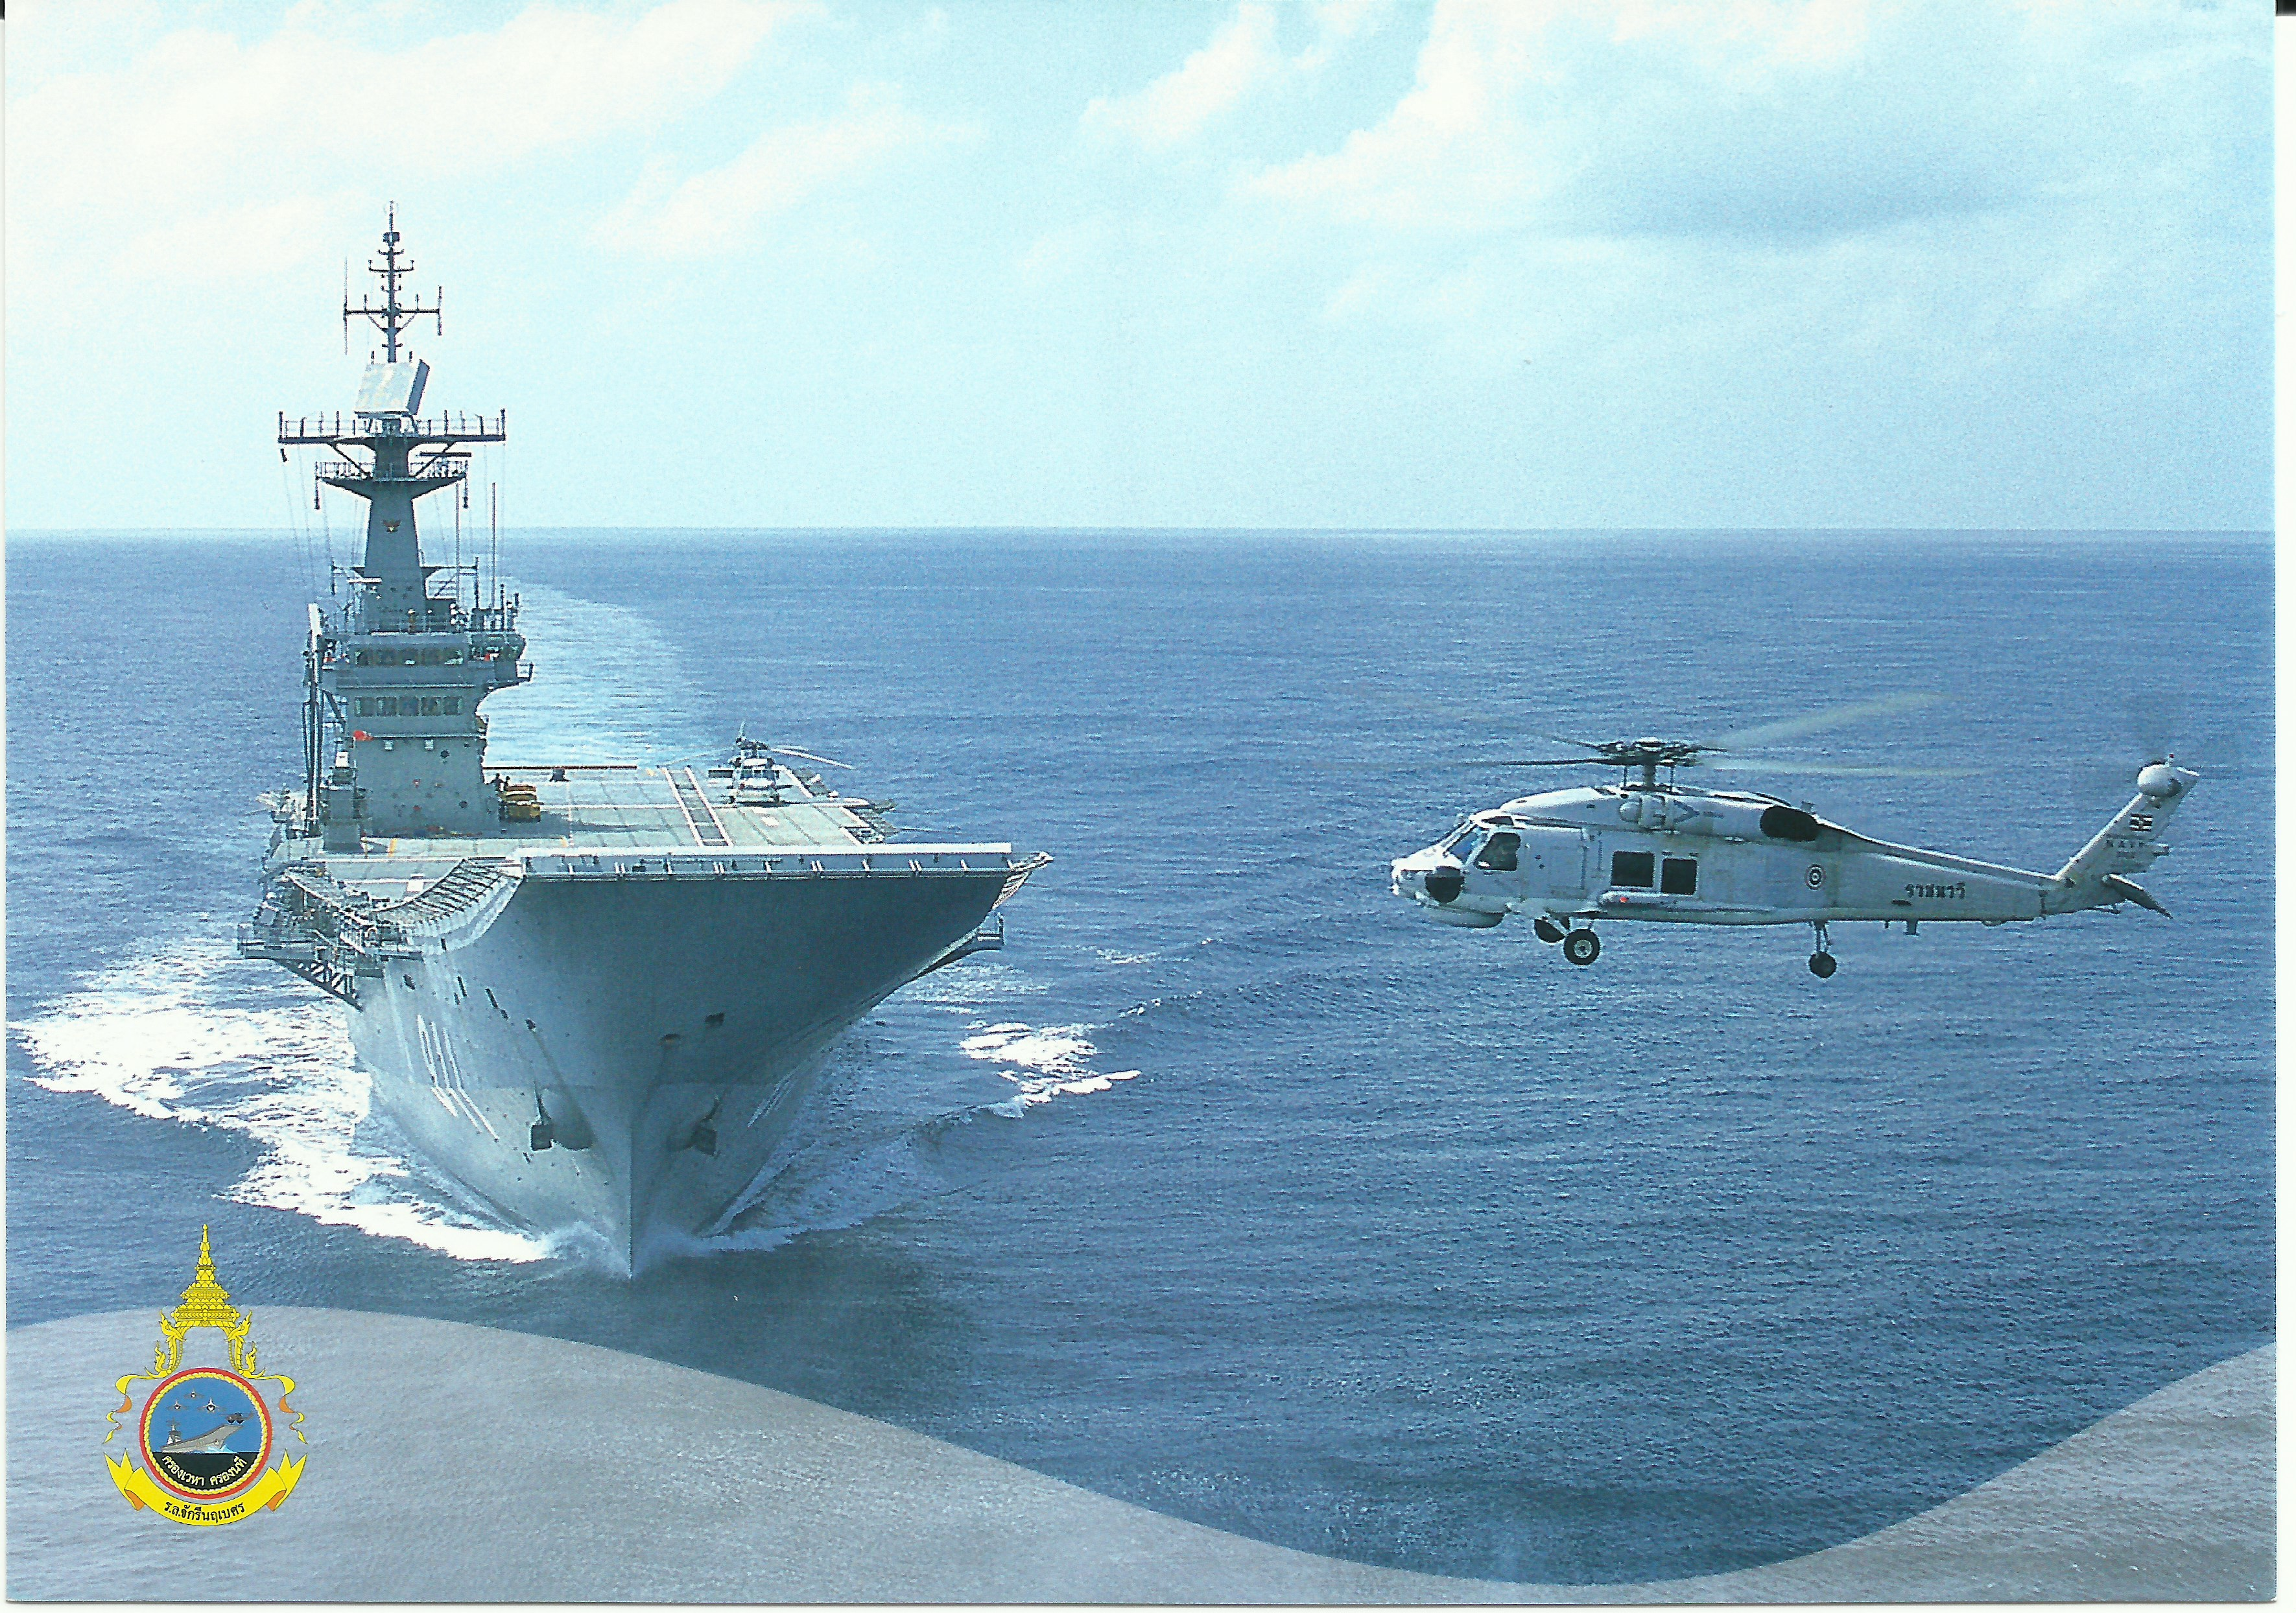 Thailand - Royal Thai Navy HTMS Chakri Naruebet pre-paid postal card #3 - 2014